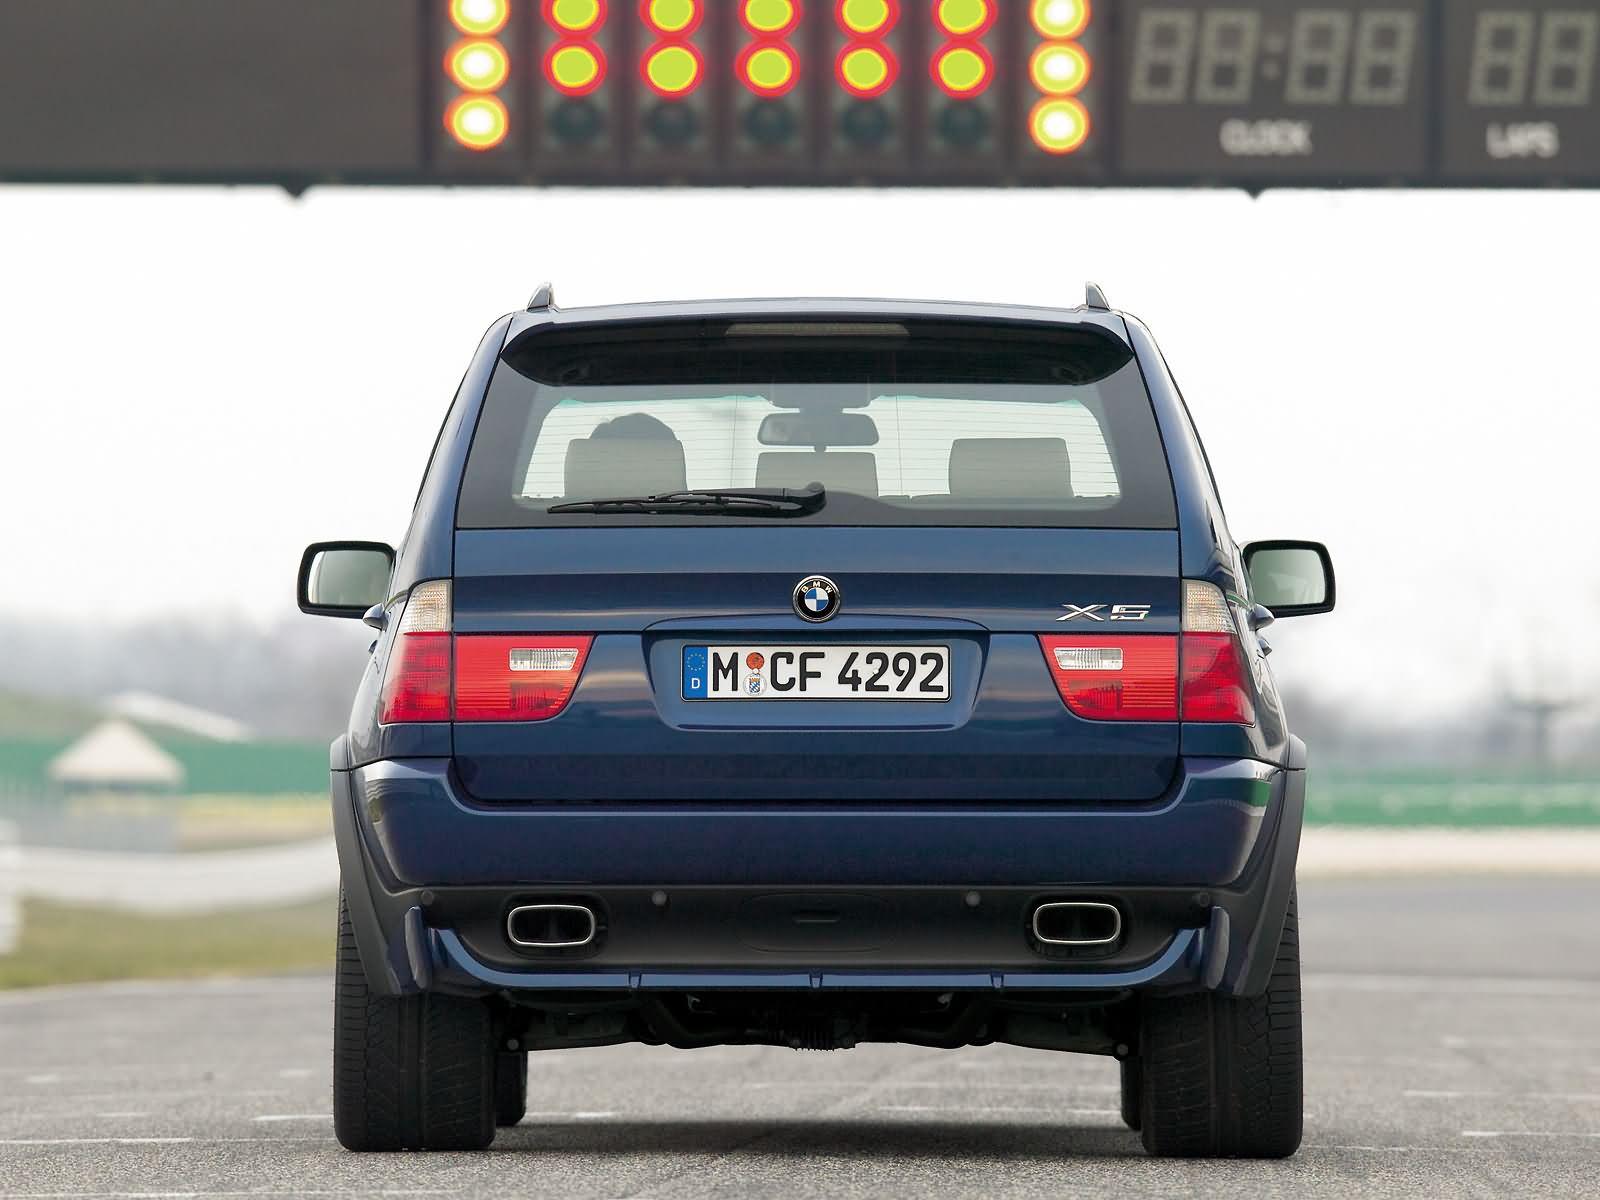 BMW-X5-E53-10.jpg